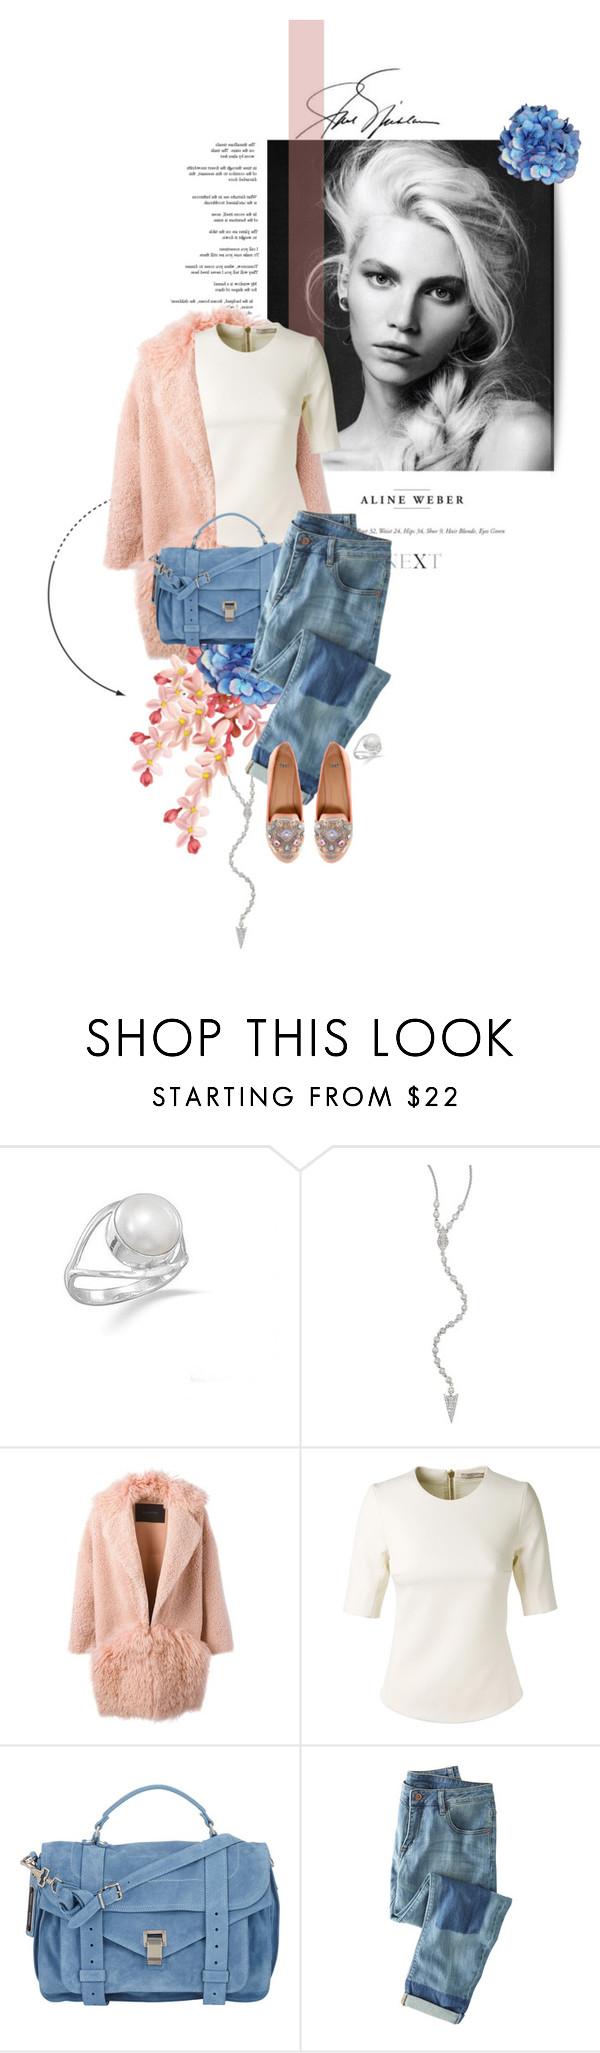 """ASOS MOONBEAM Flats"" by kitti-takacs ❤ liked on Polyvore featuring Meira T, BLANCHA, Bouchra Jarrar, Proenza Schouler, Wrap, ASOS, women's clothing, women's fashion, women and female"